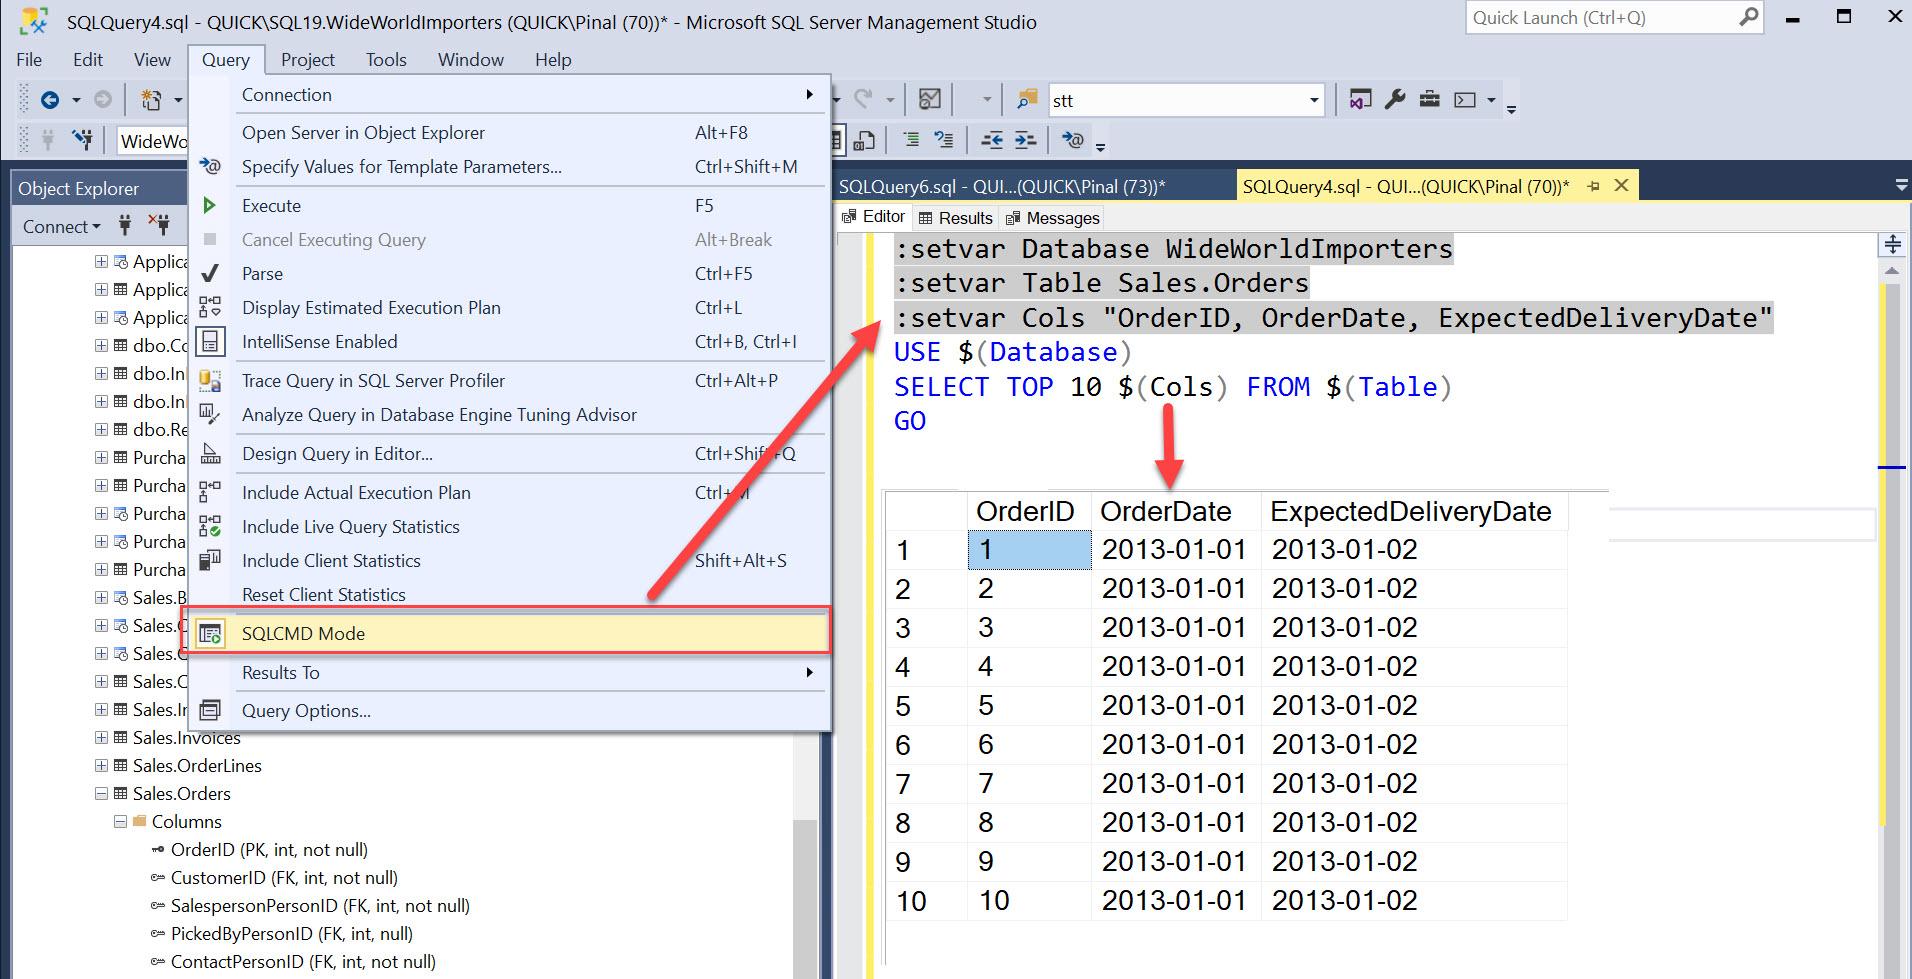 SQL SERVER Management Studio and SQLCMD Mode sqlcmdmode2